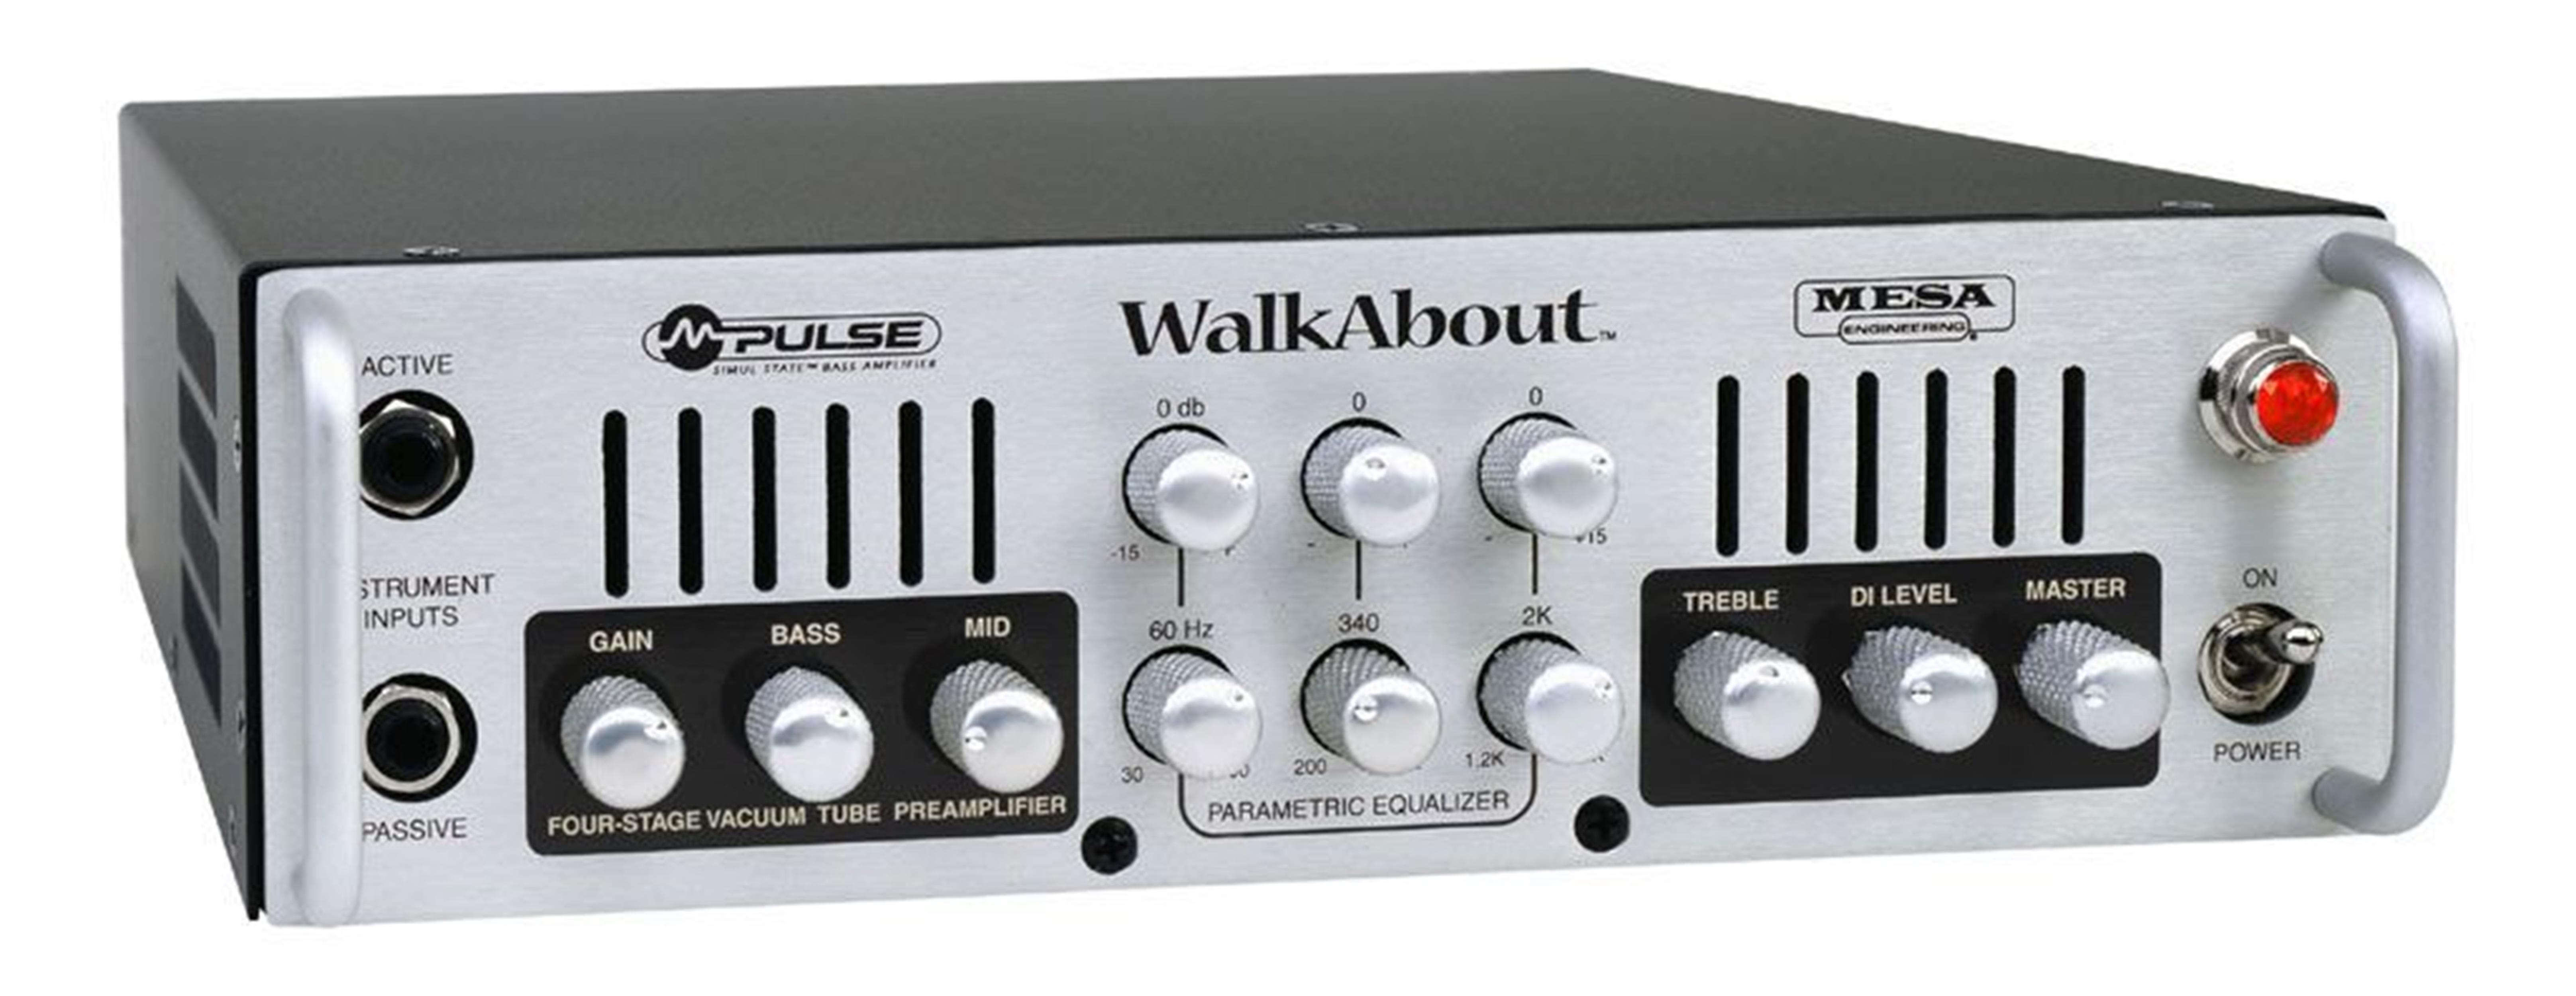 Mesa/Boogie WalkAbout - 300W (165 @ 8) - c/borsa - Bassi Amplificatori - Testate